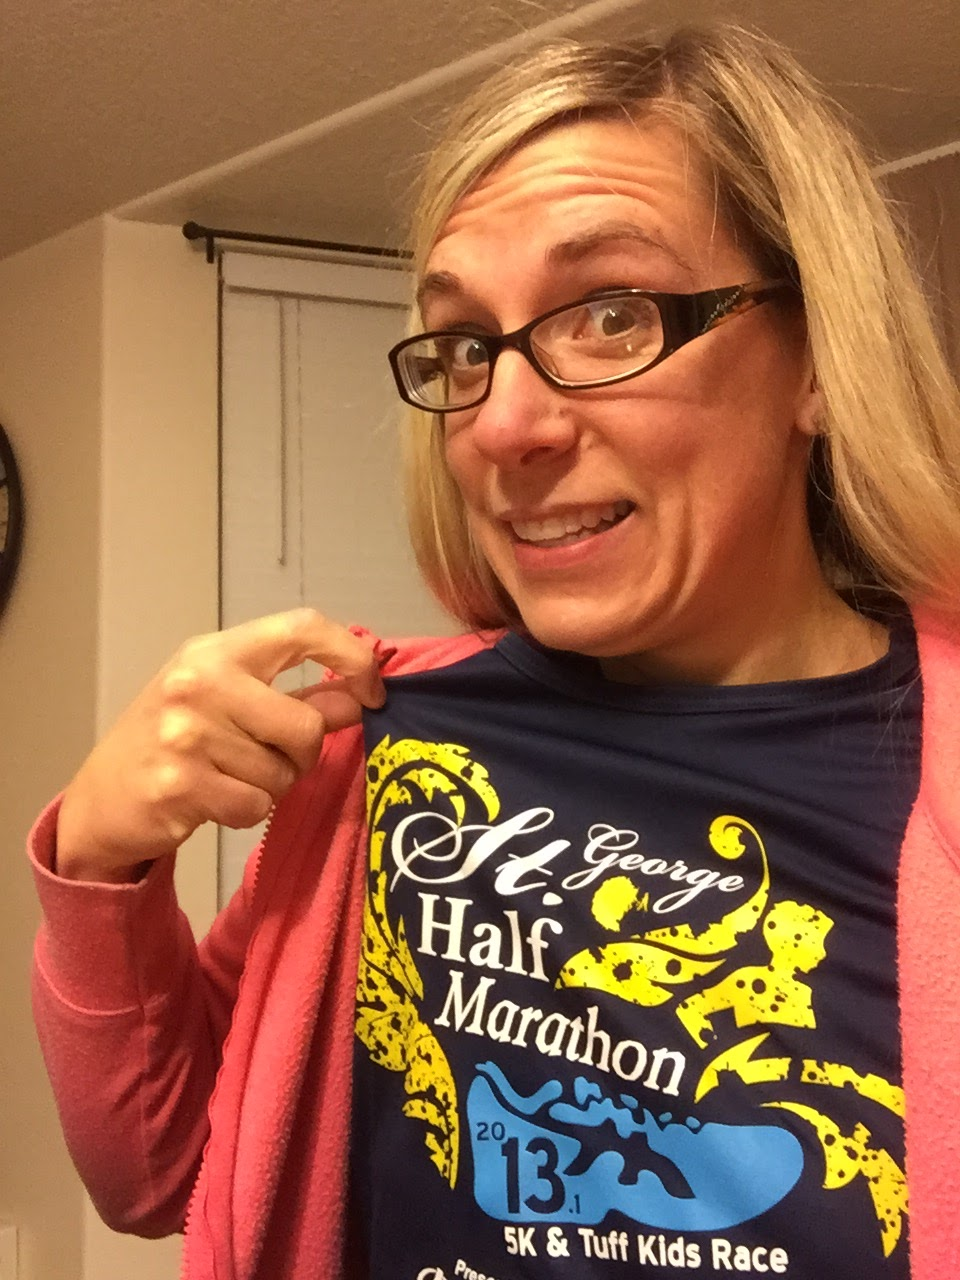 St. George Half marathon race t shirt training for dopey challenge